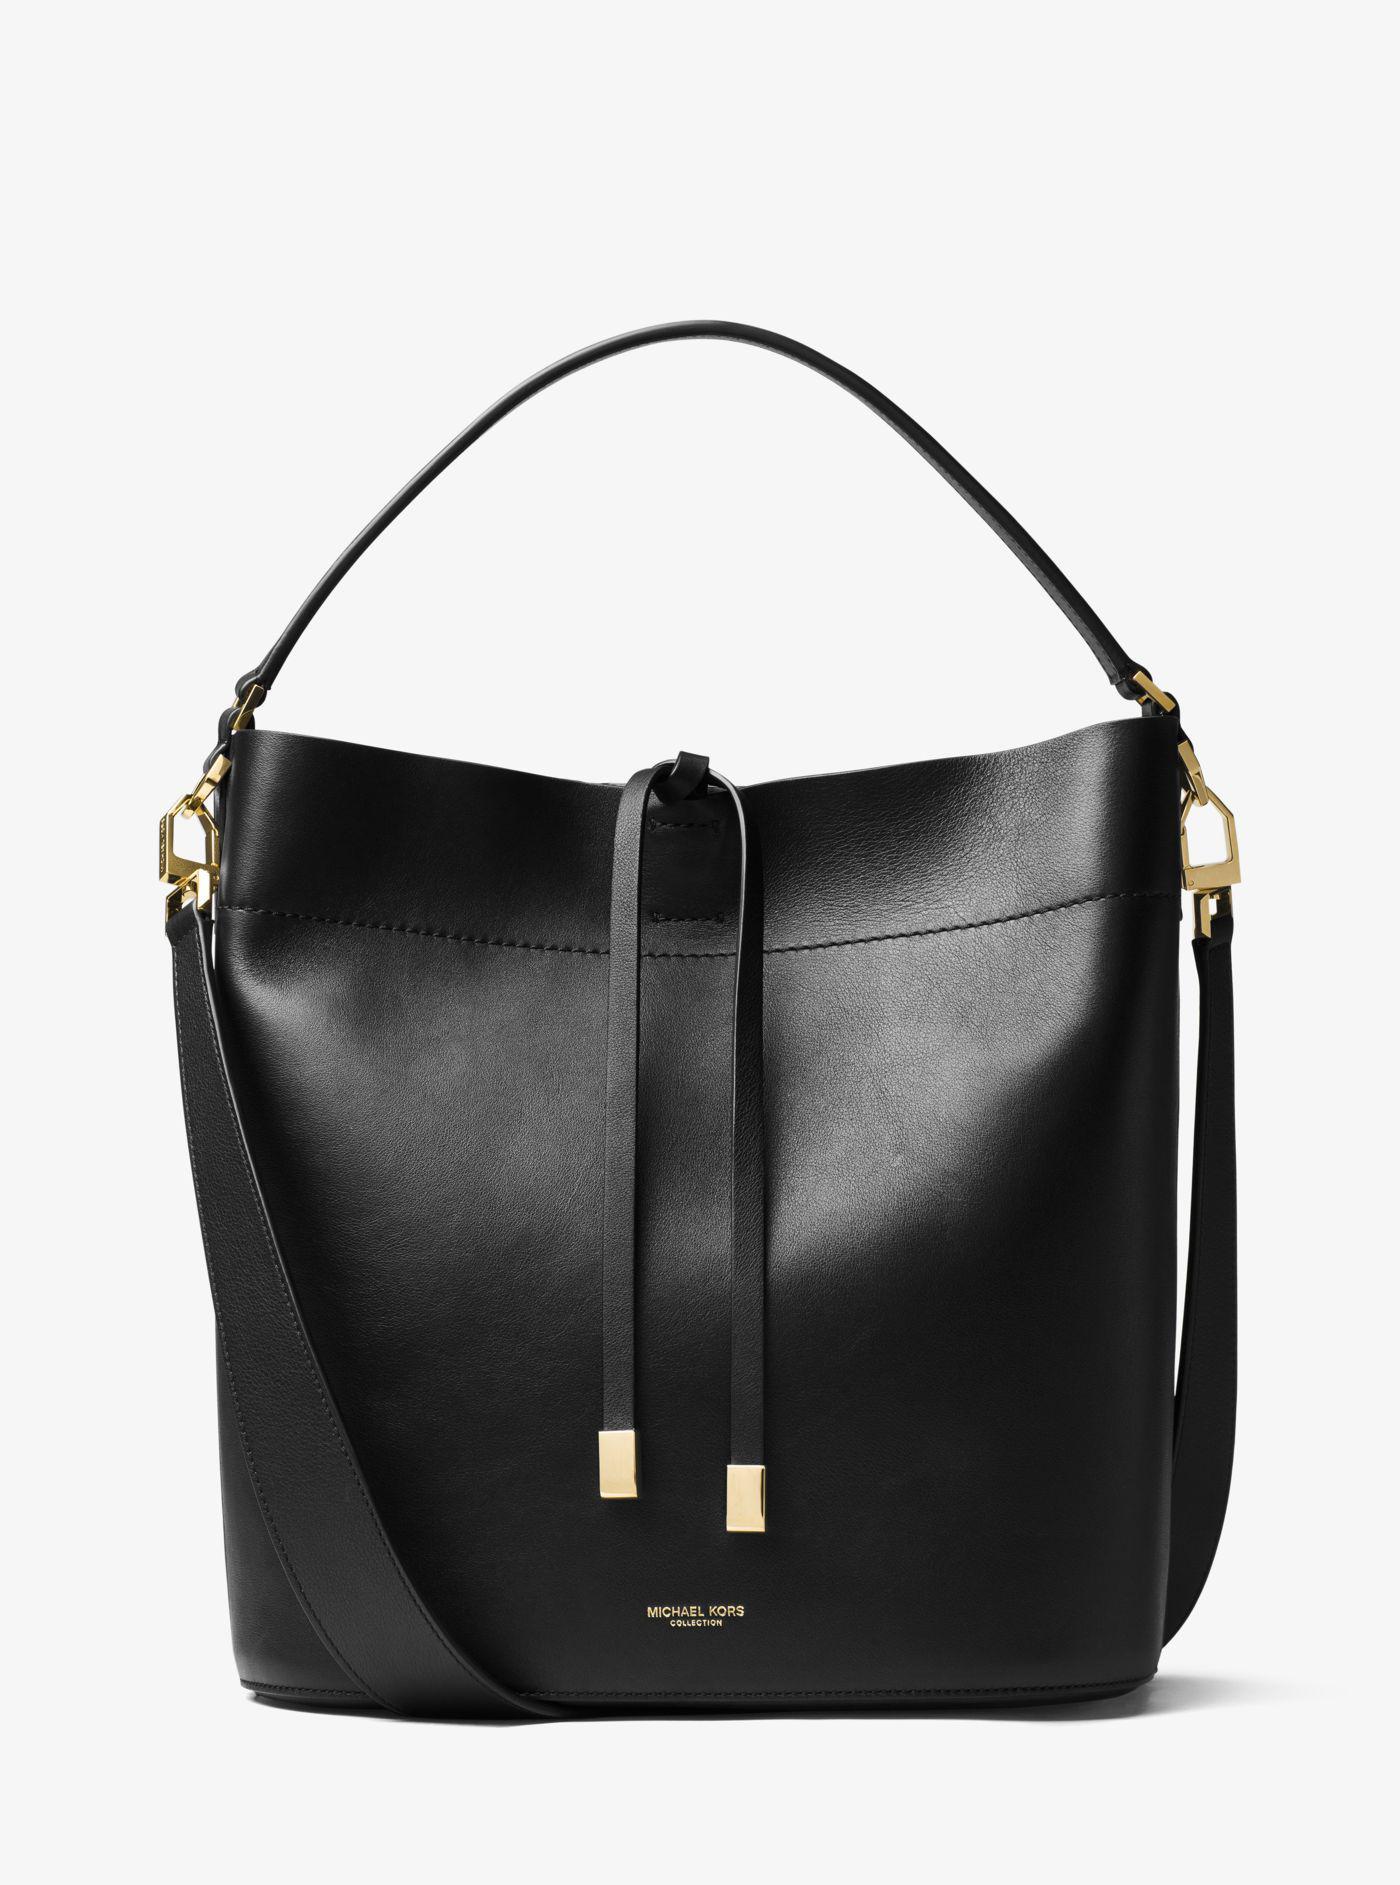 6f6129469f78 Michael Kors Miranda Large Leather Shoulder Bag in Black - Lyst